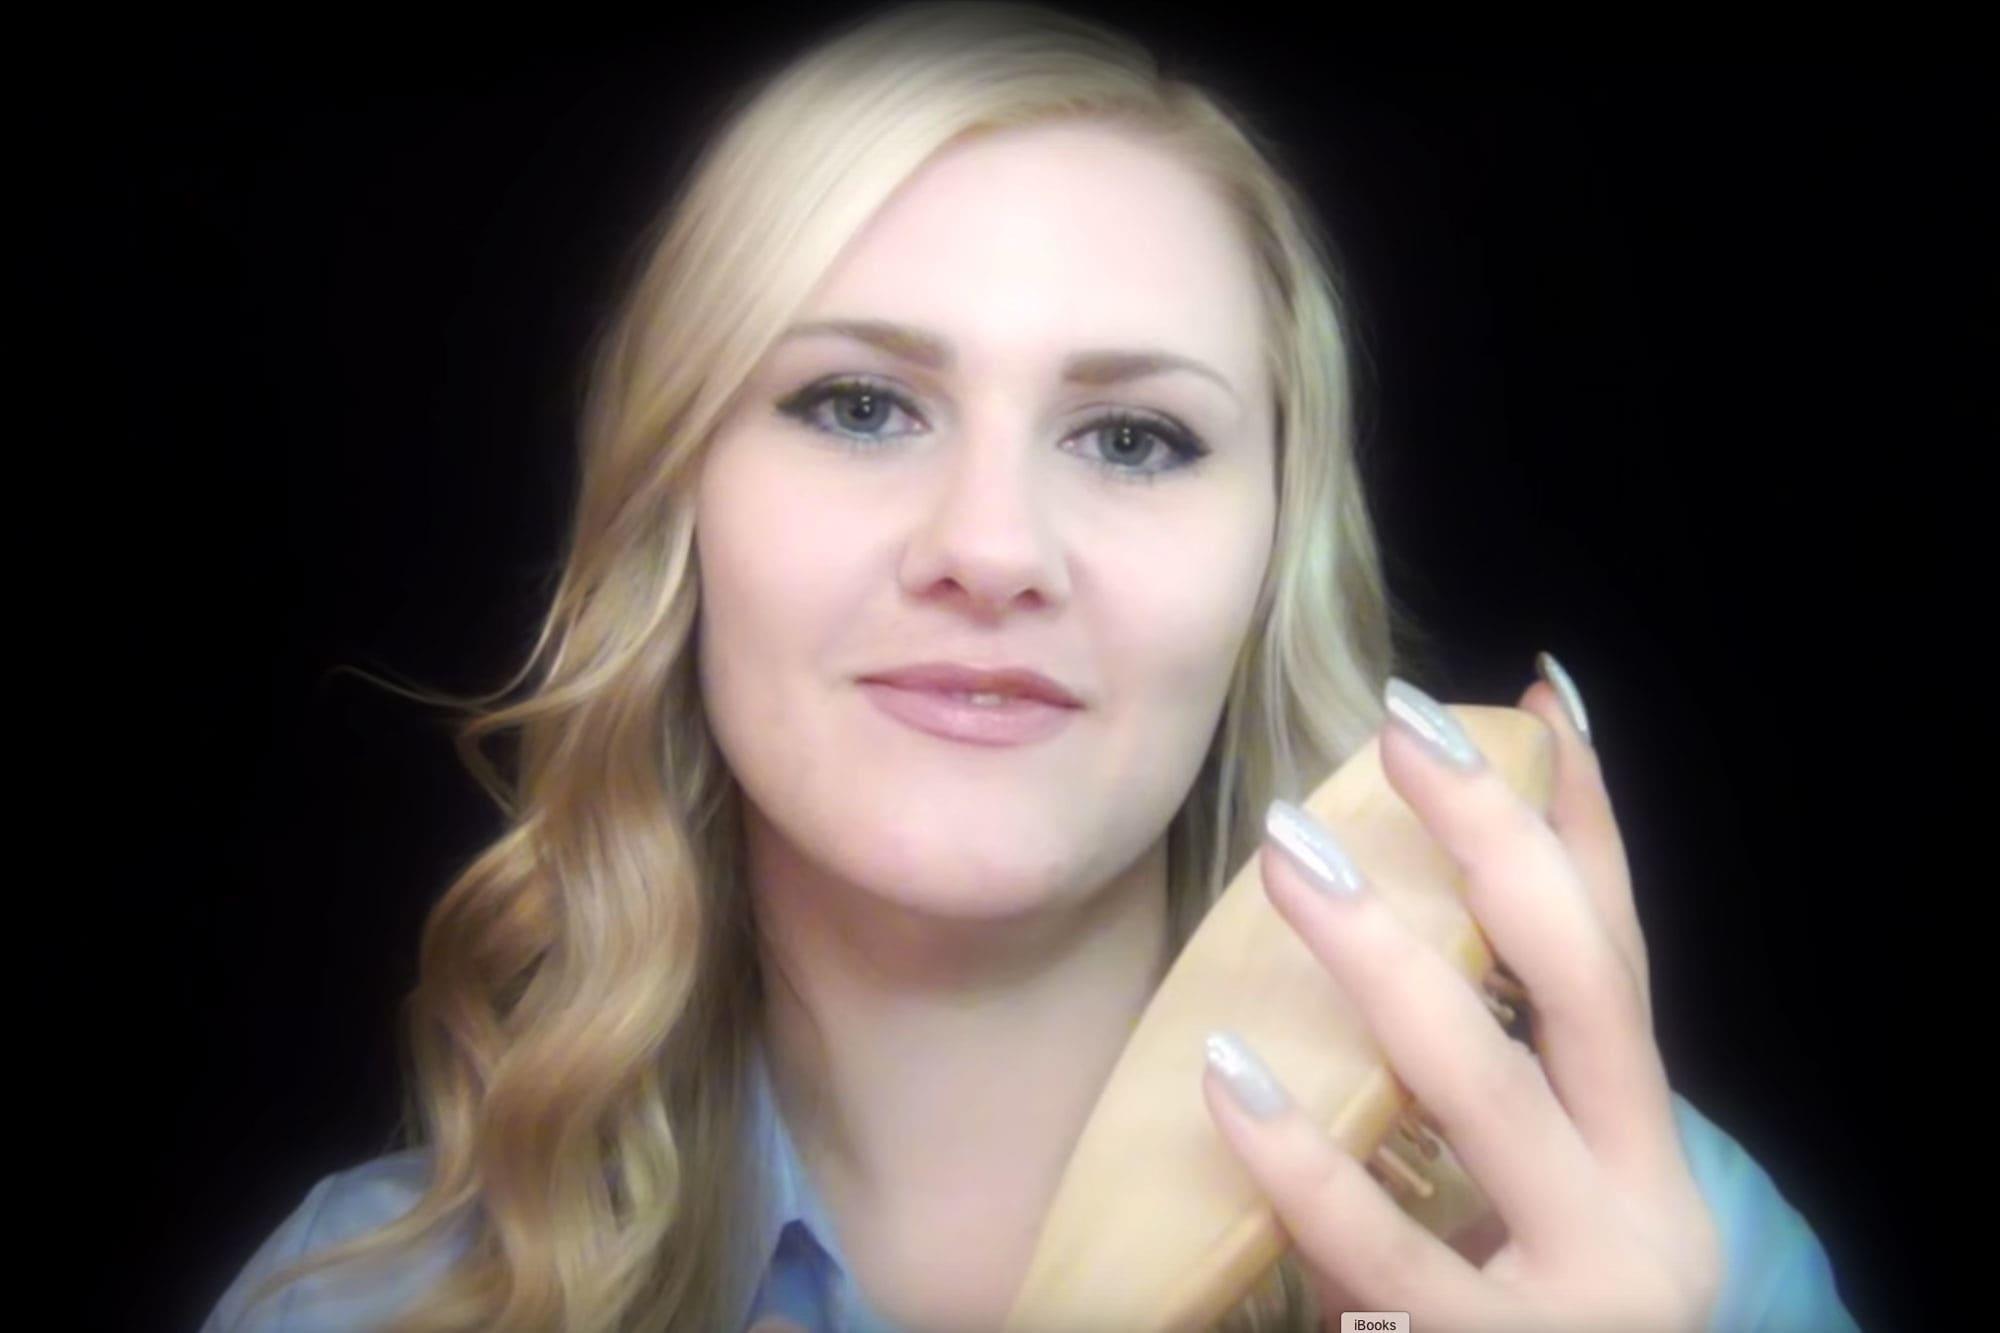 Inside the bizarre world of YouTube ASMR videos